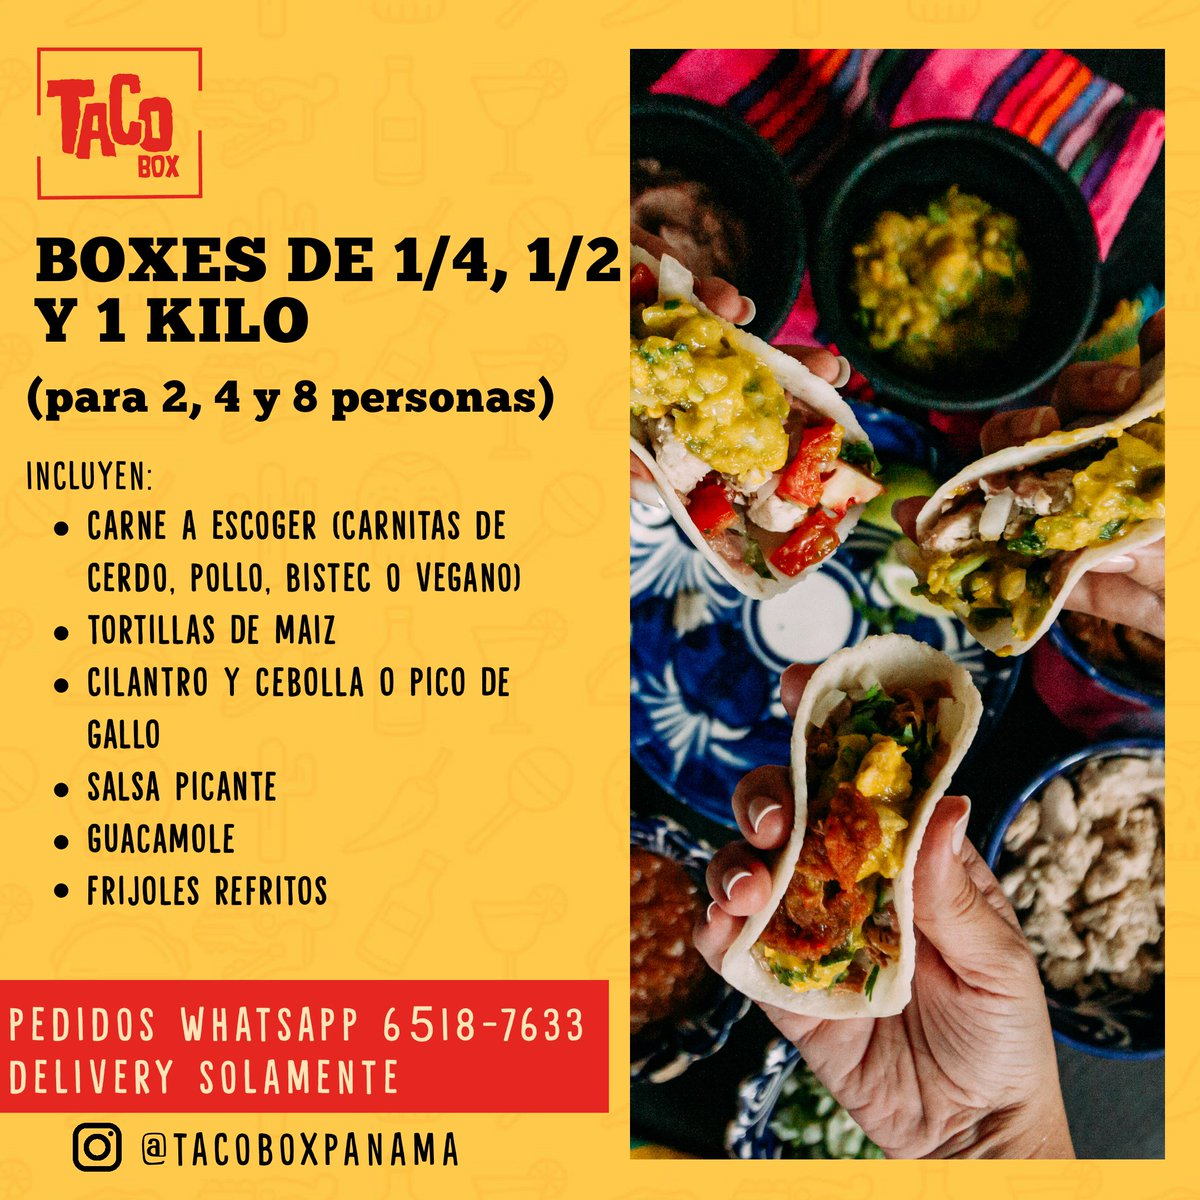 Aún puedes hacer tu pedido para HOY al whatsapp https://t.co/2BVWONouhx o en el siguiente link https://t.co/lgX4L0F6KN  Síguenos por Instagram  https://t.co/WlZ2WoFADc  #ConsumeLocal #panama #tacos #guacamole https://t.co/pFolJzlpng